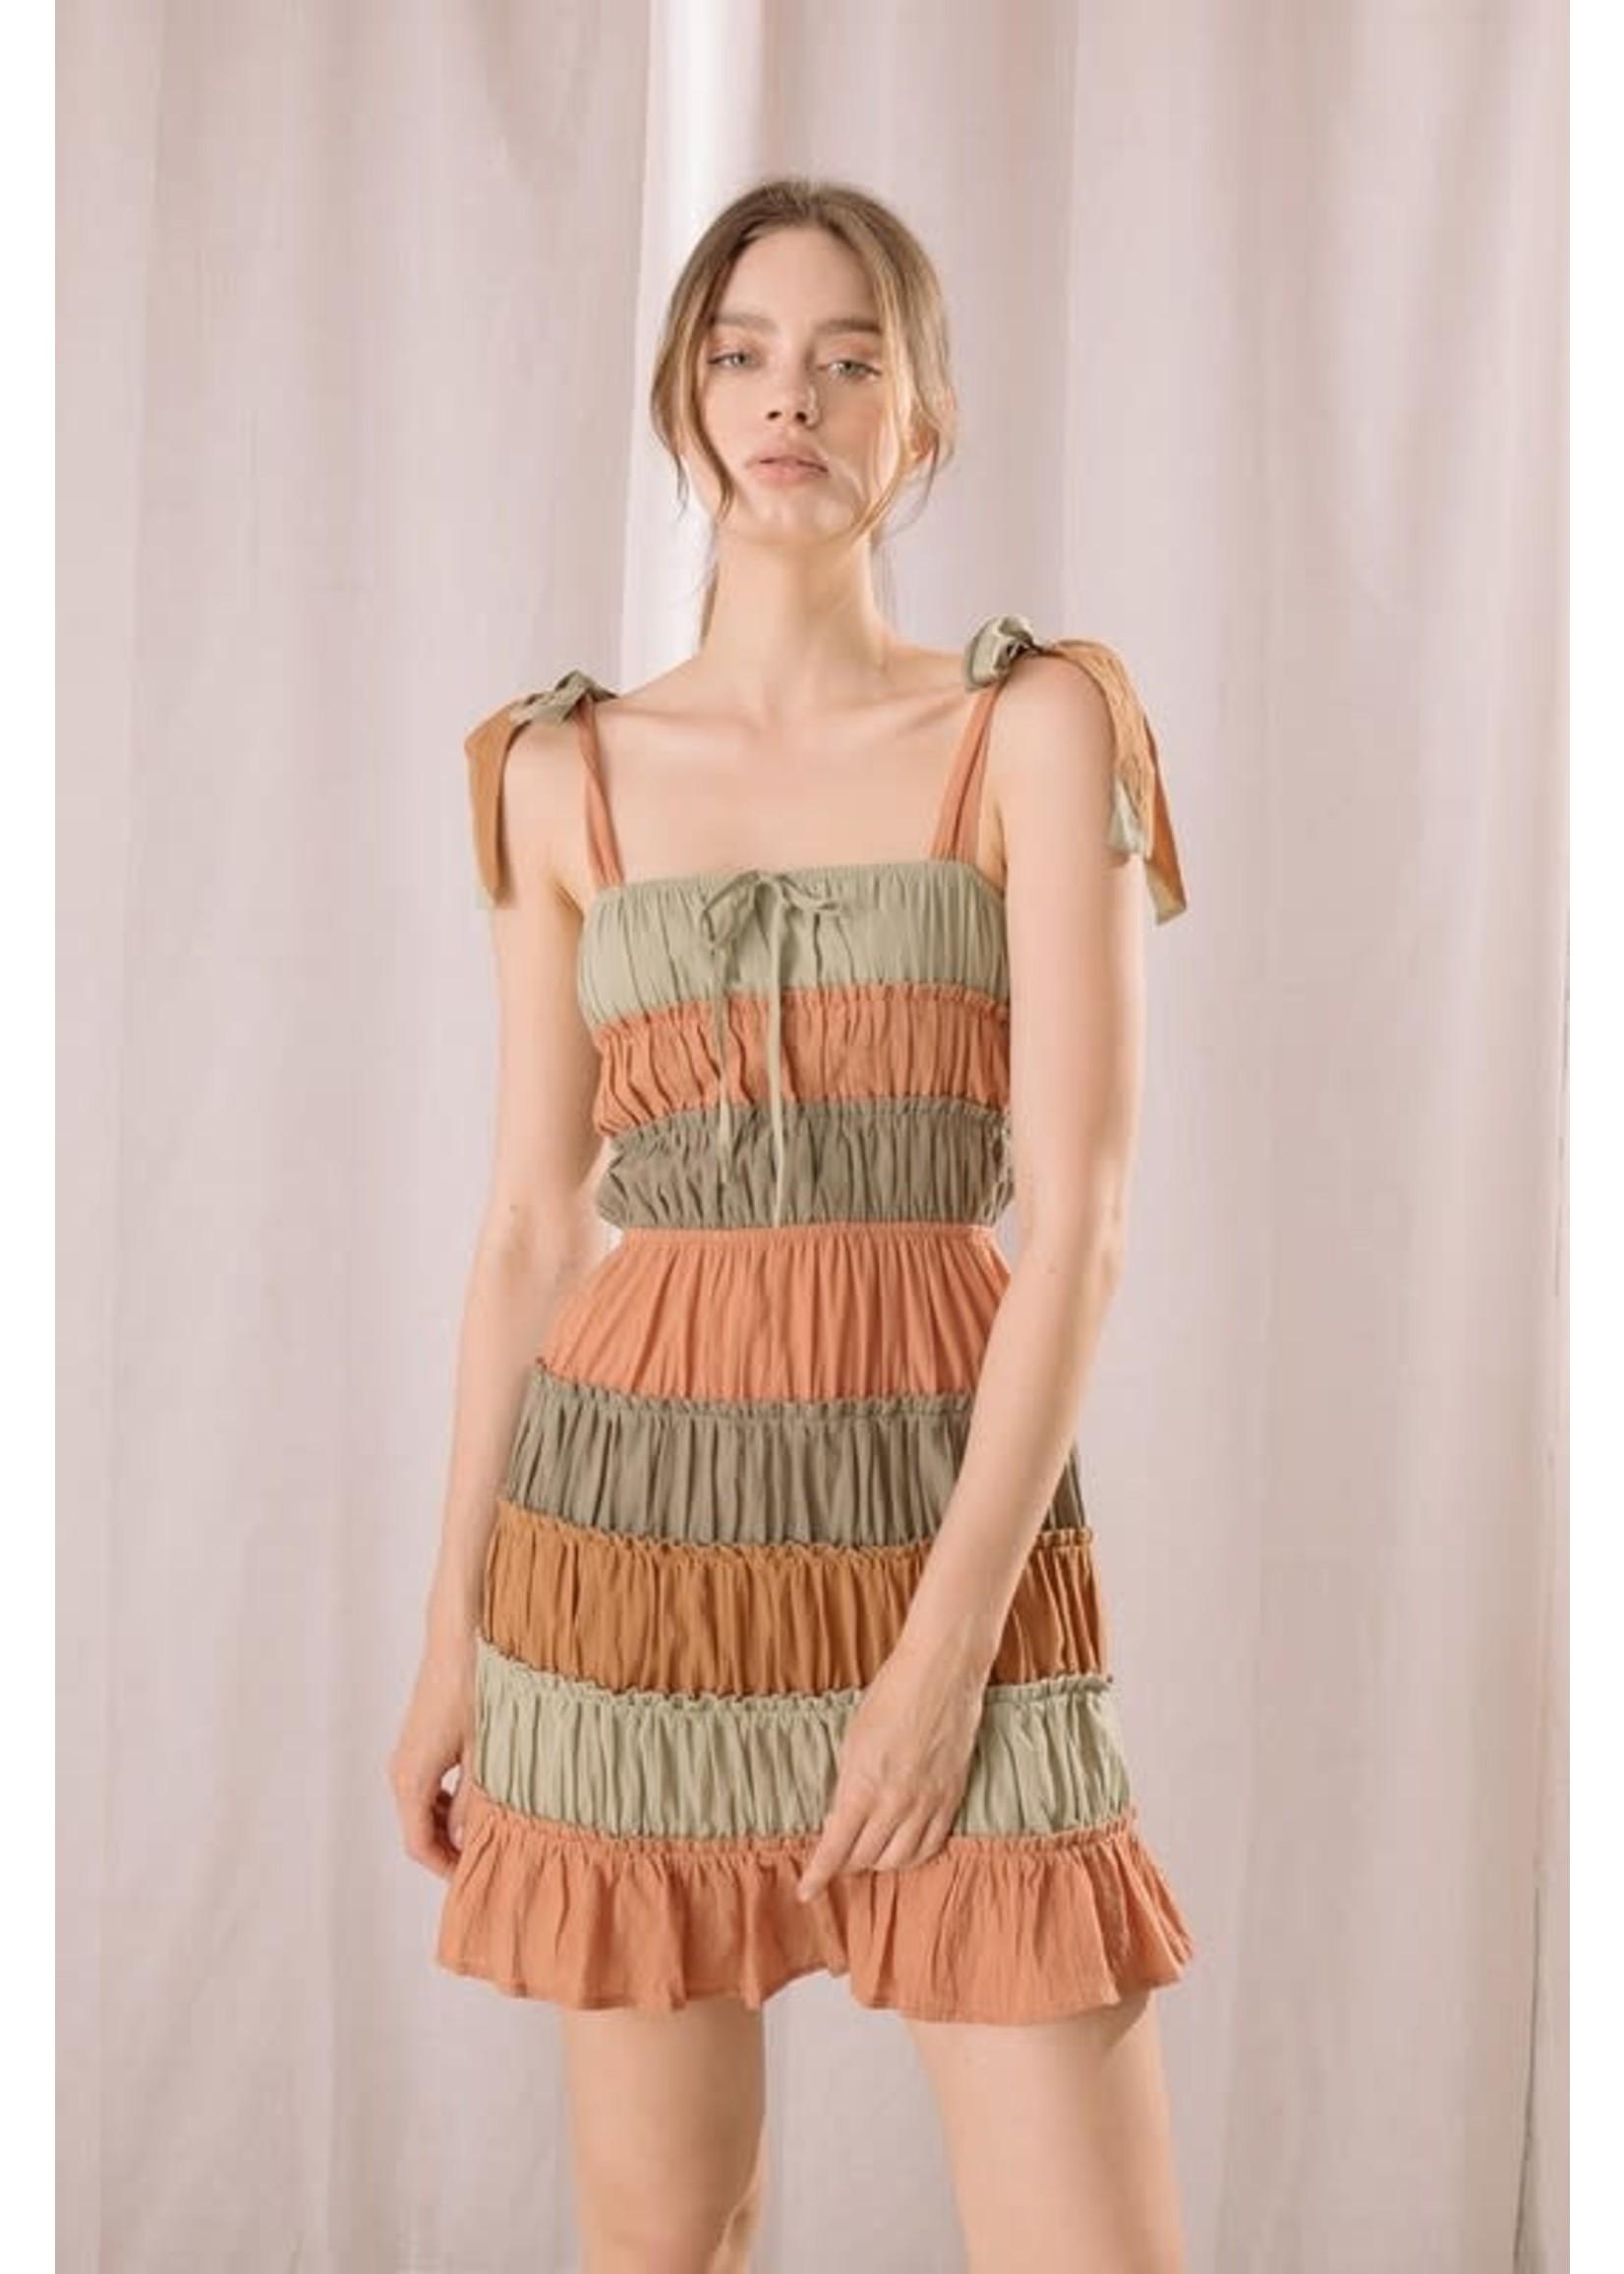 Storia Ruffled Colorblock Mini Dress - JD3365